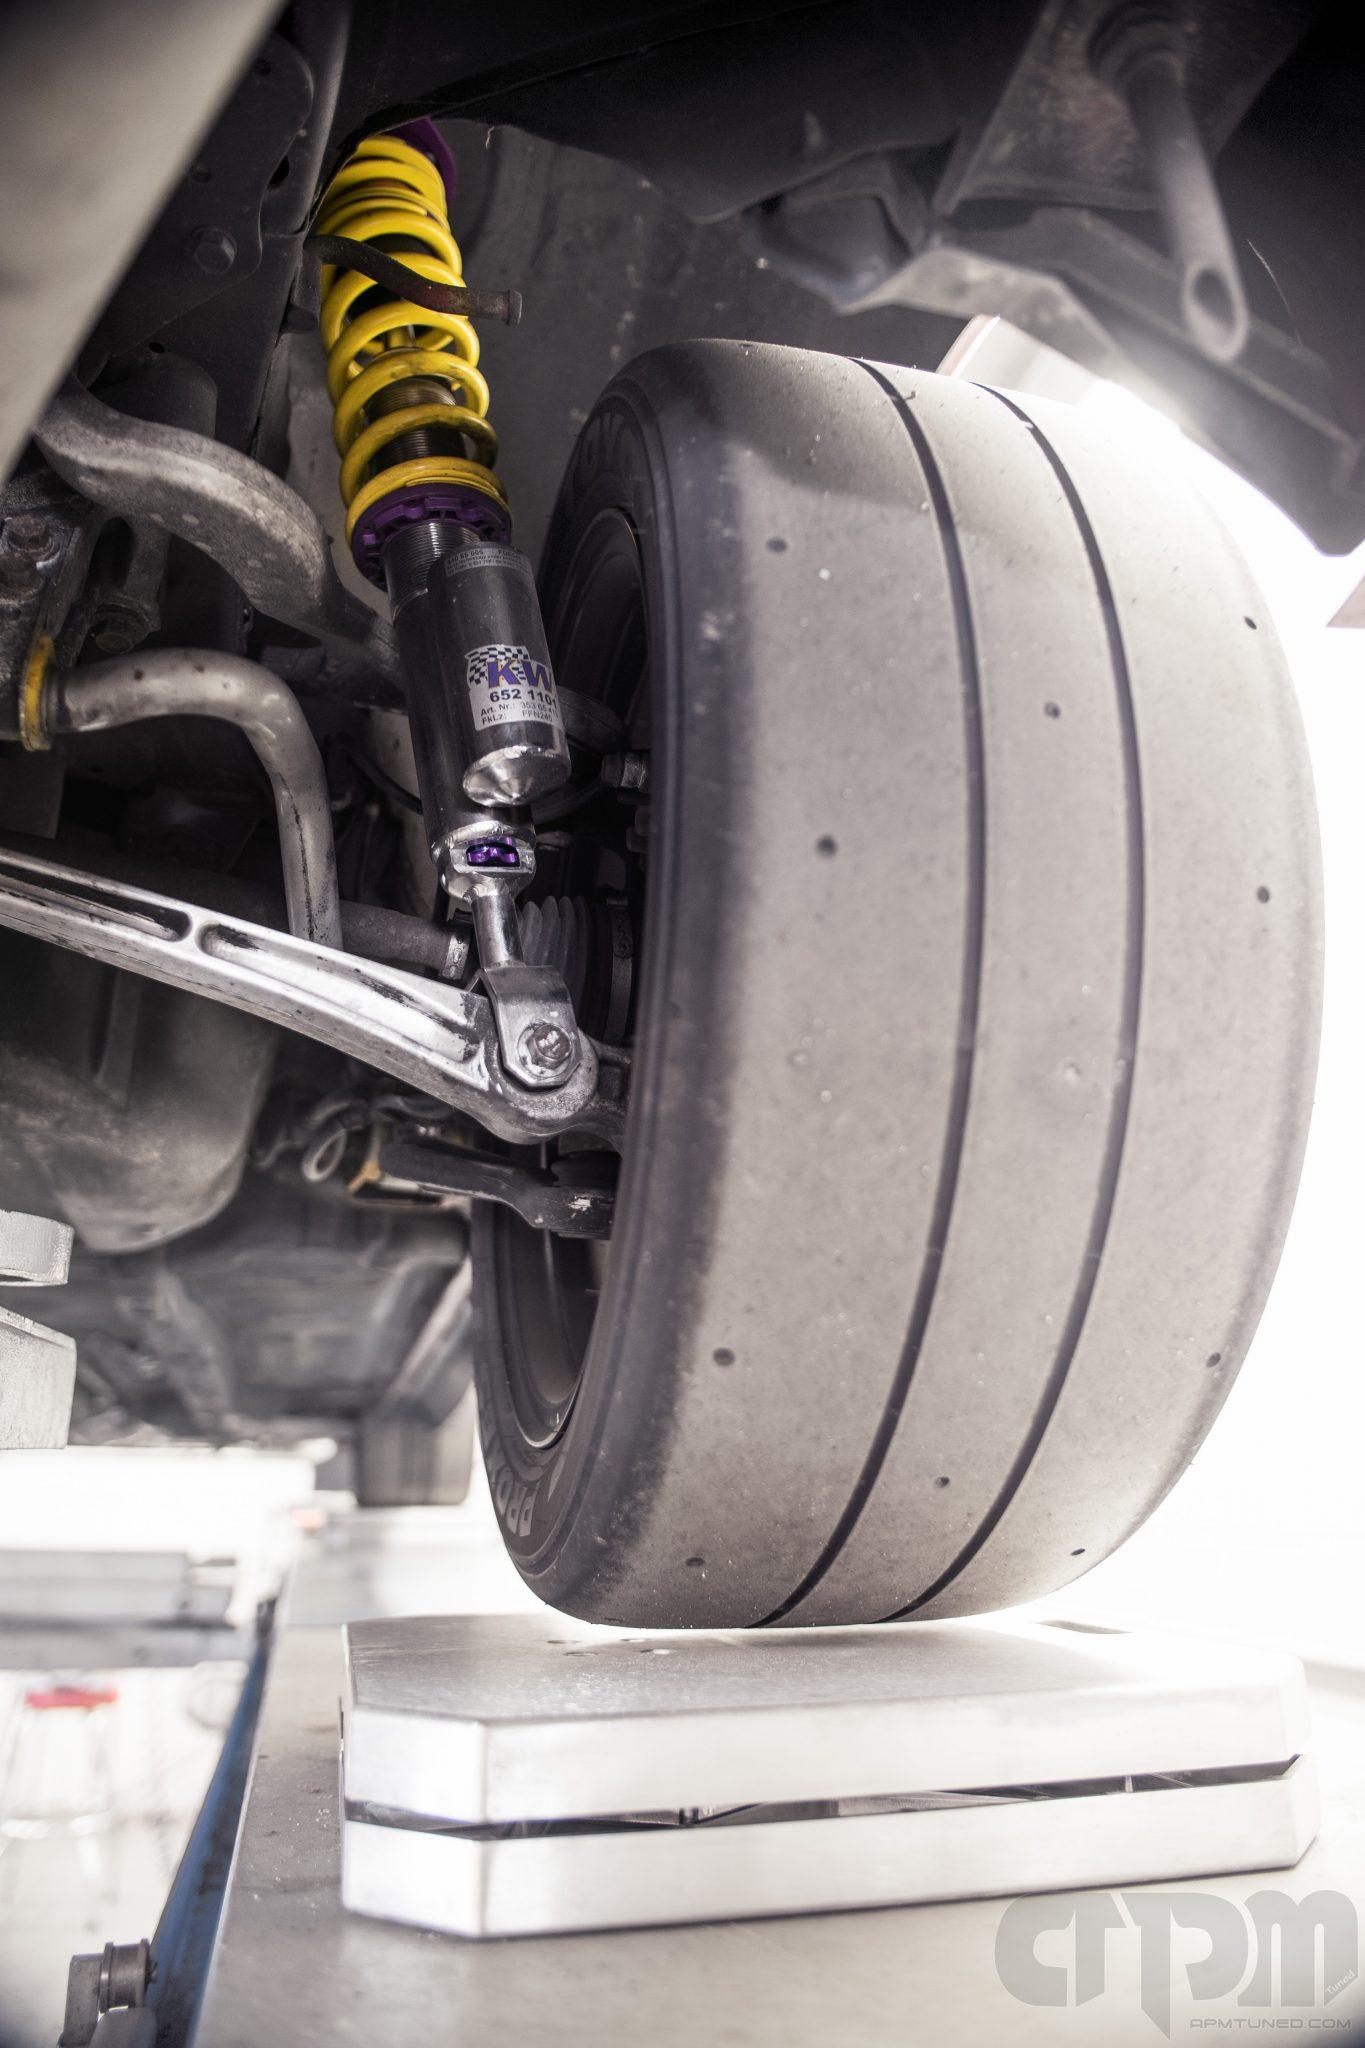 close up of our shop race car Mitsubishi Evo getting corner balanced